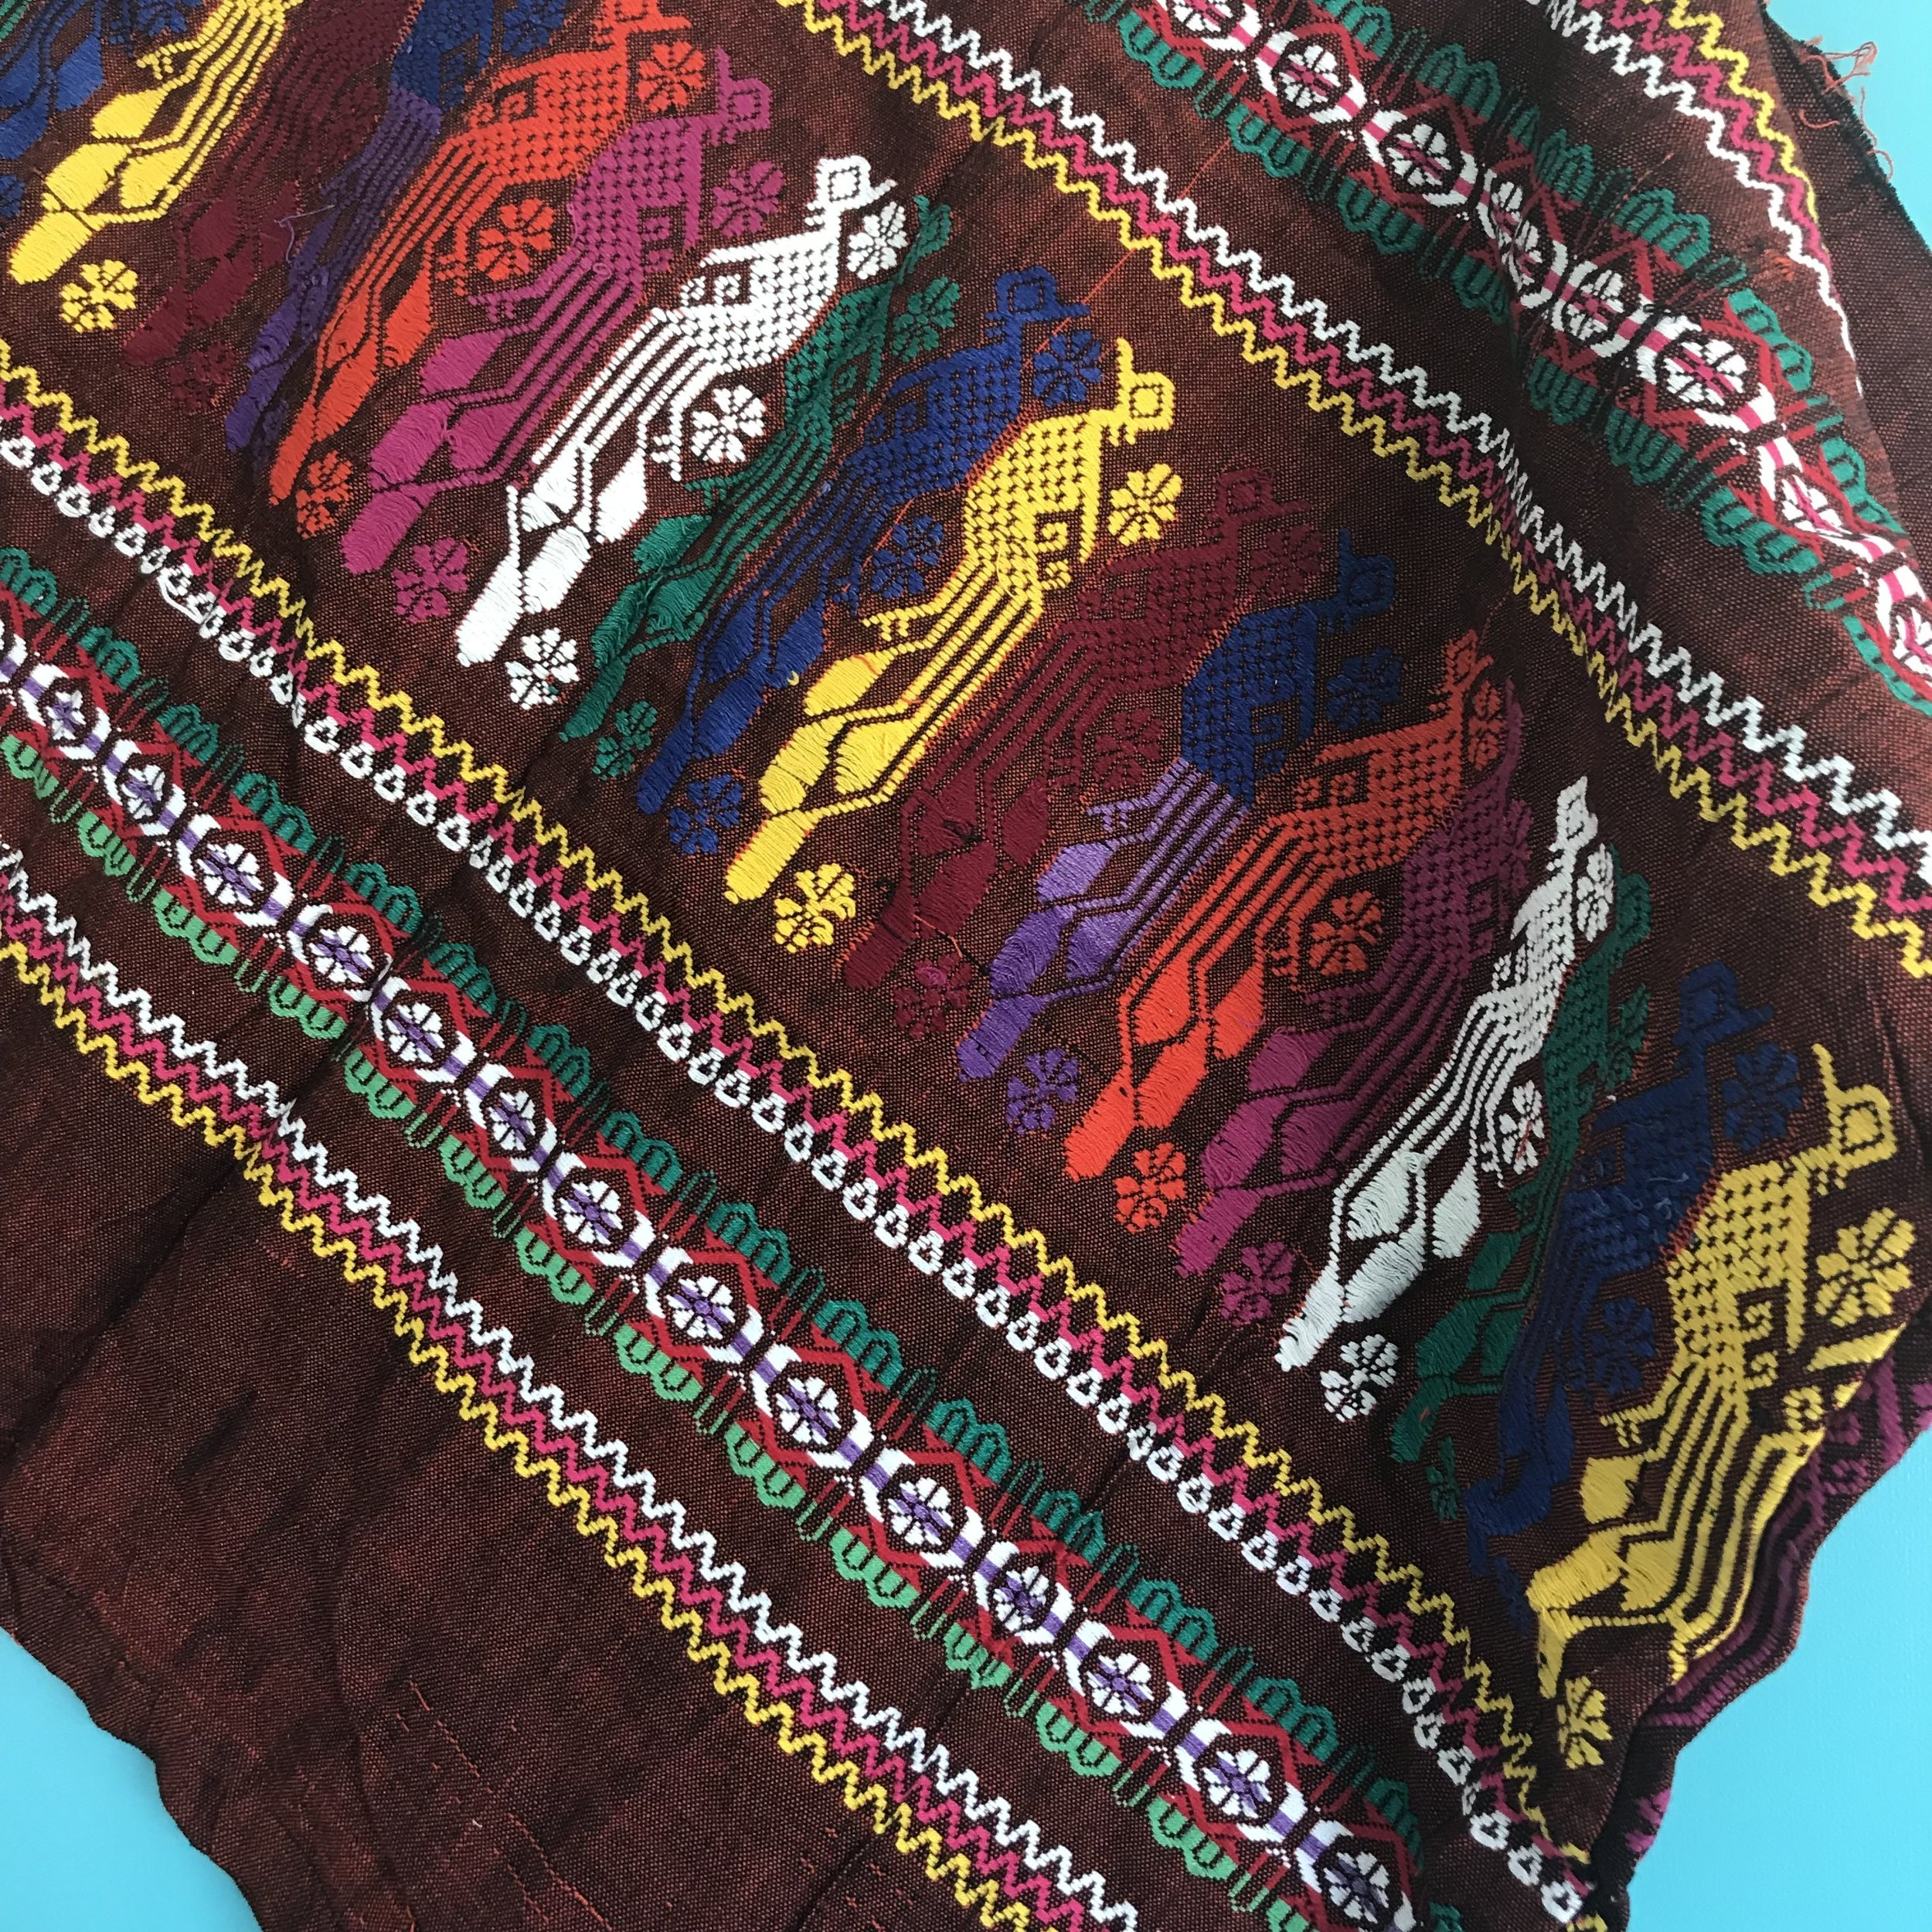 Handwoven Textile: Guatemala